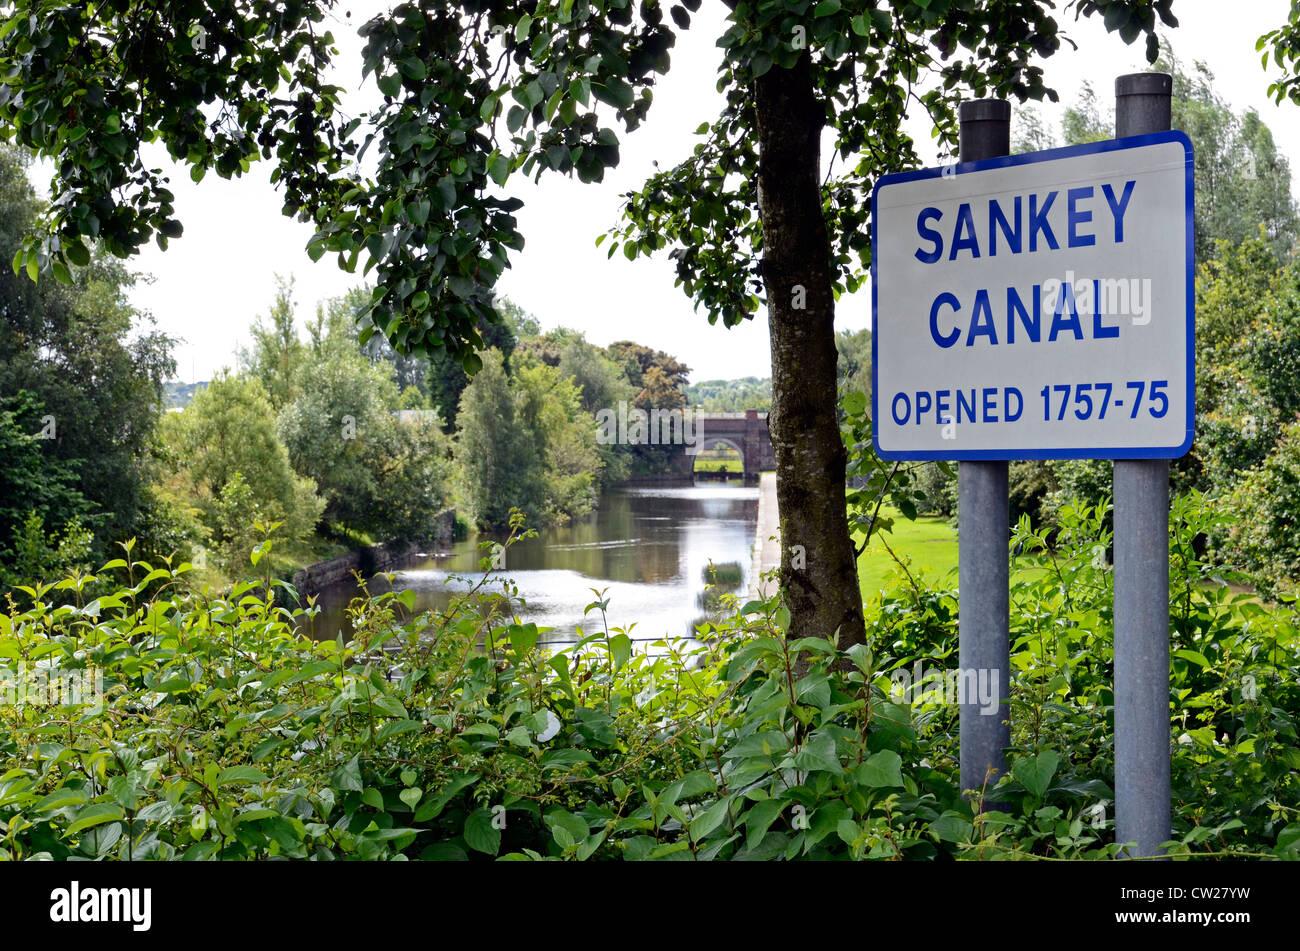 The Sankey canal in St.Helens, Lancashire, England, UK Stock Photo